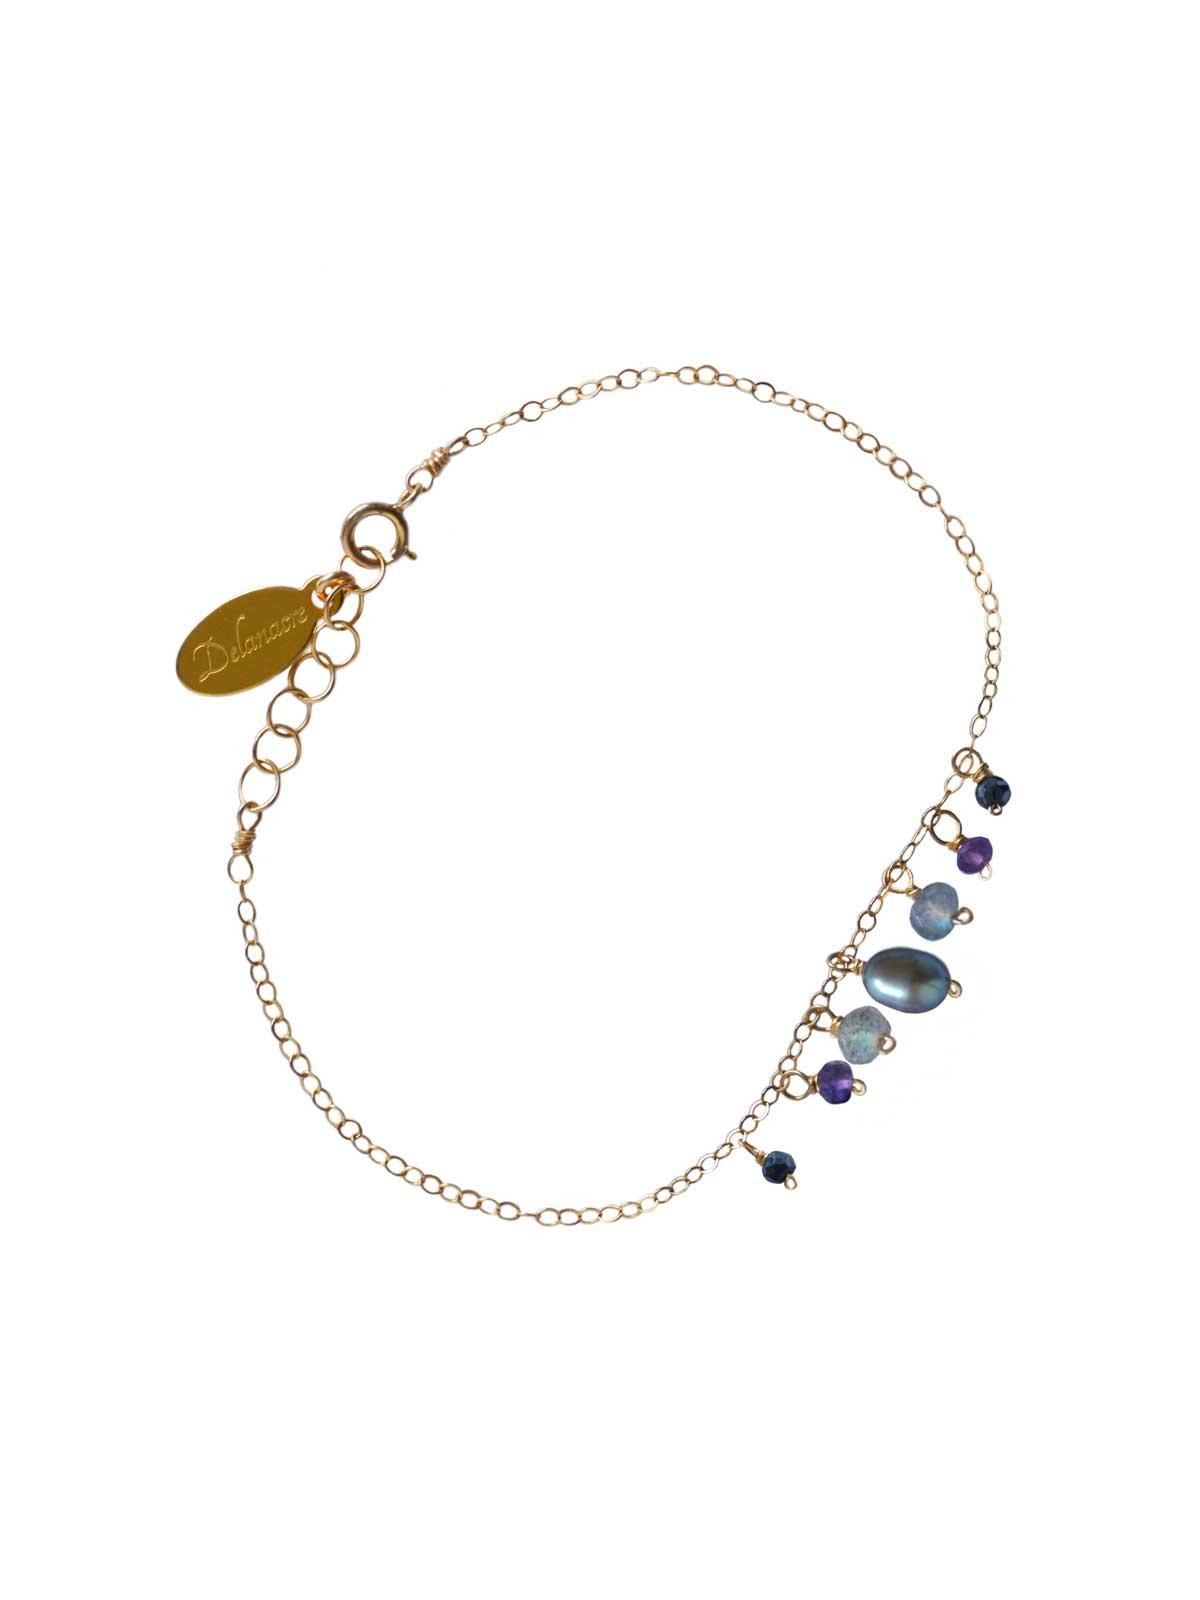 Bracelet in Gold-filled 14 Karat chain Labradorite Black Spinel Amethyst gray Freshwater Pearl